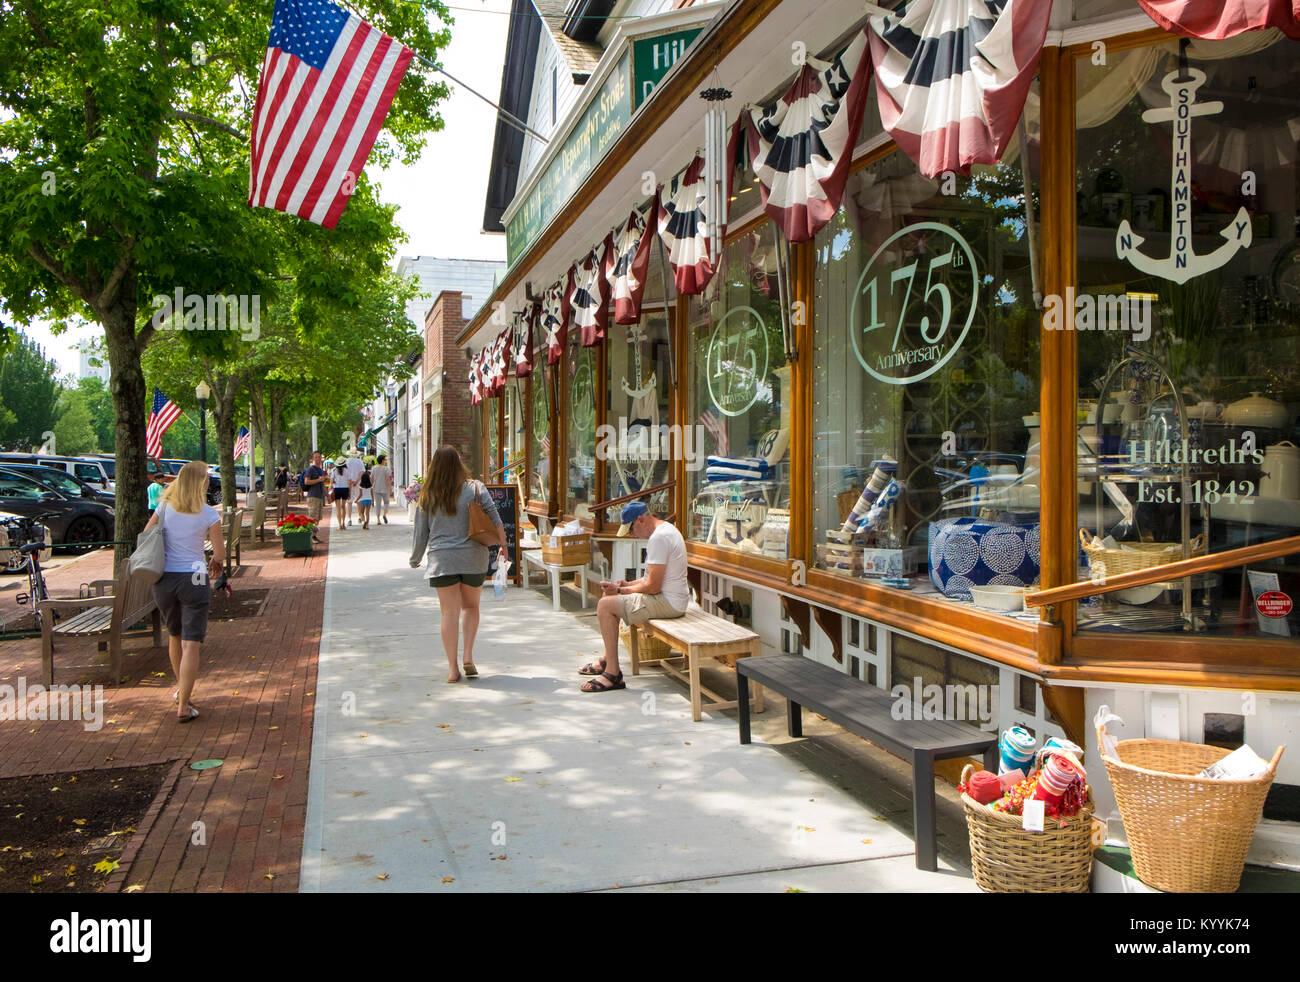 Les Hamptons, Long Island - Main Street dans le village de Southampton, New York, USA Photo Stock